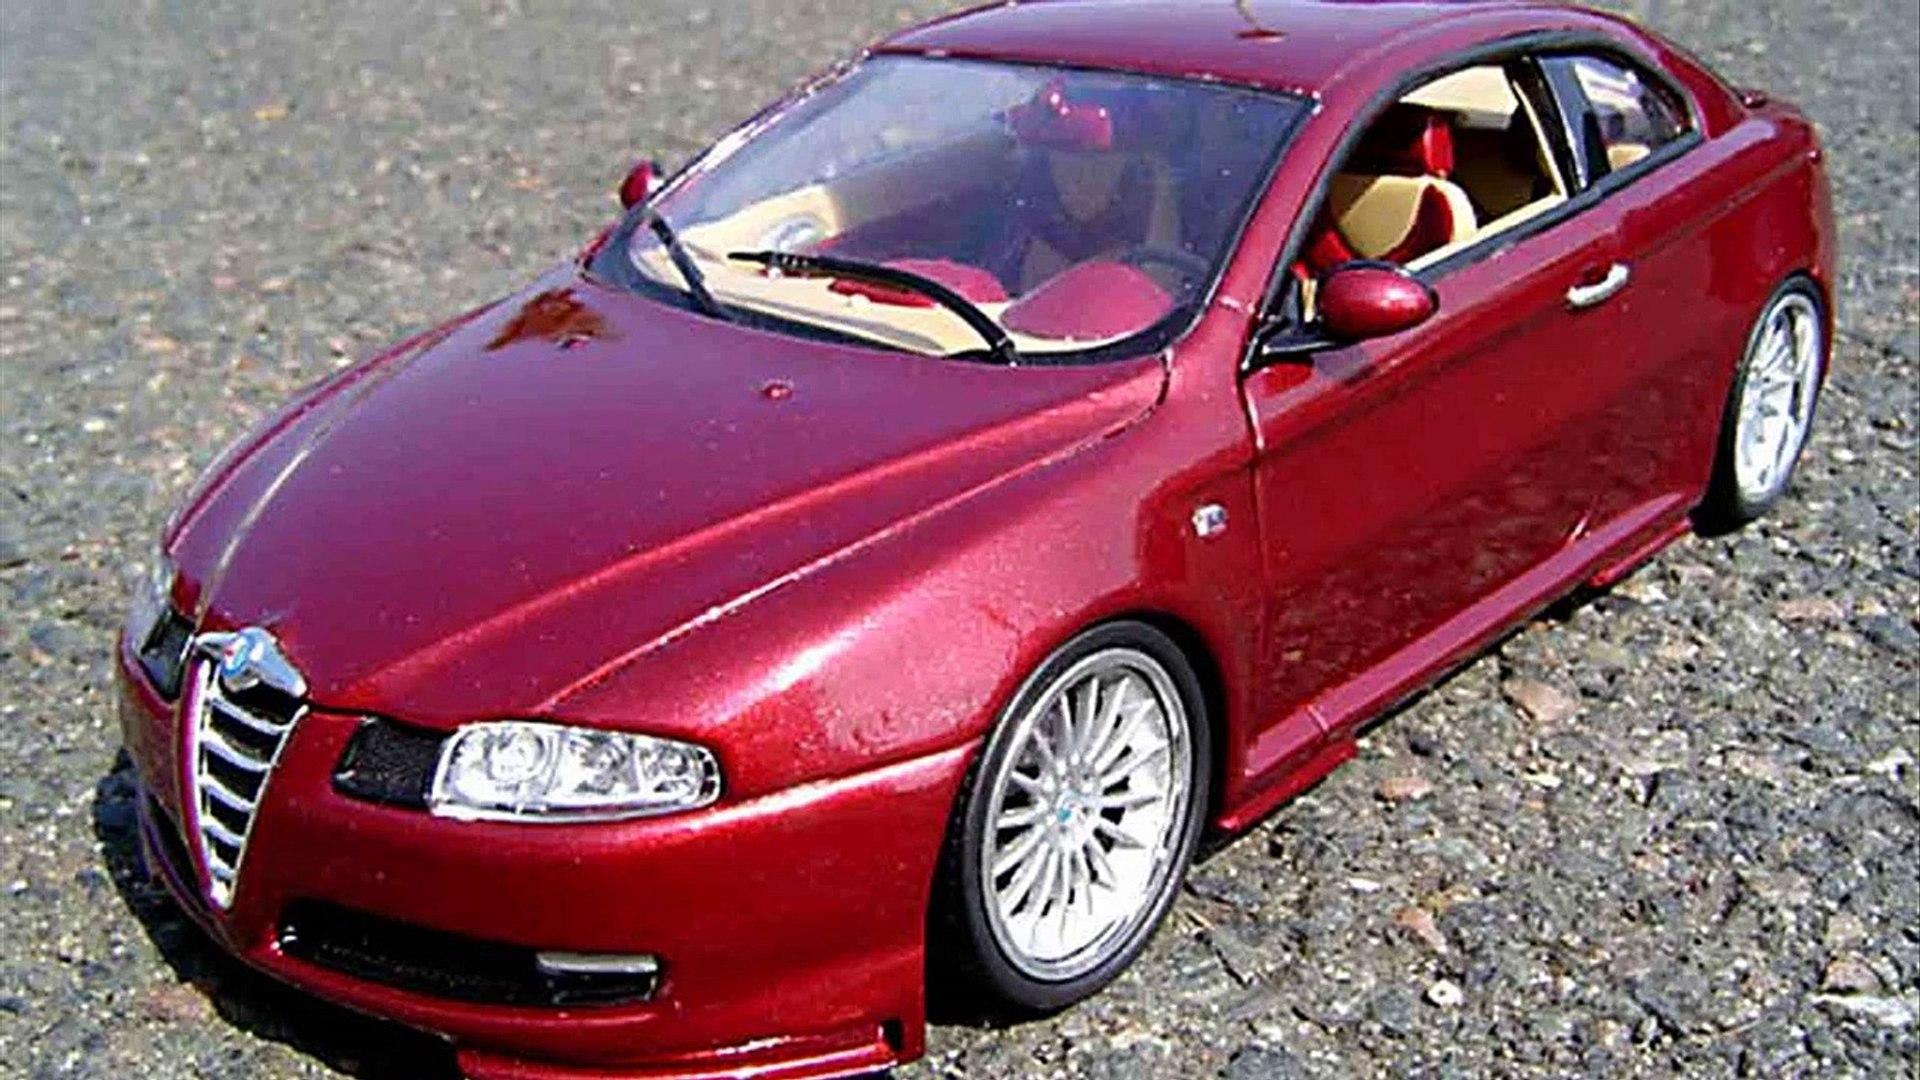 Alfa Romeo Gt Tuning Video Dailymotion